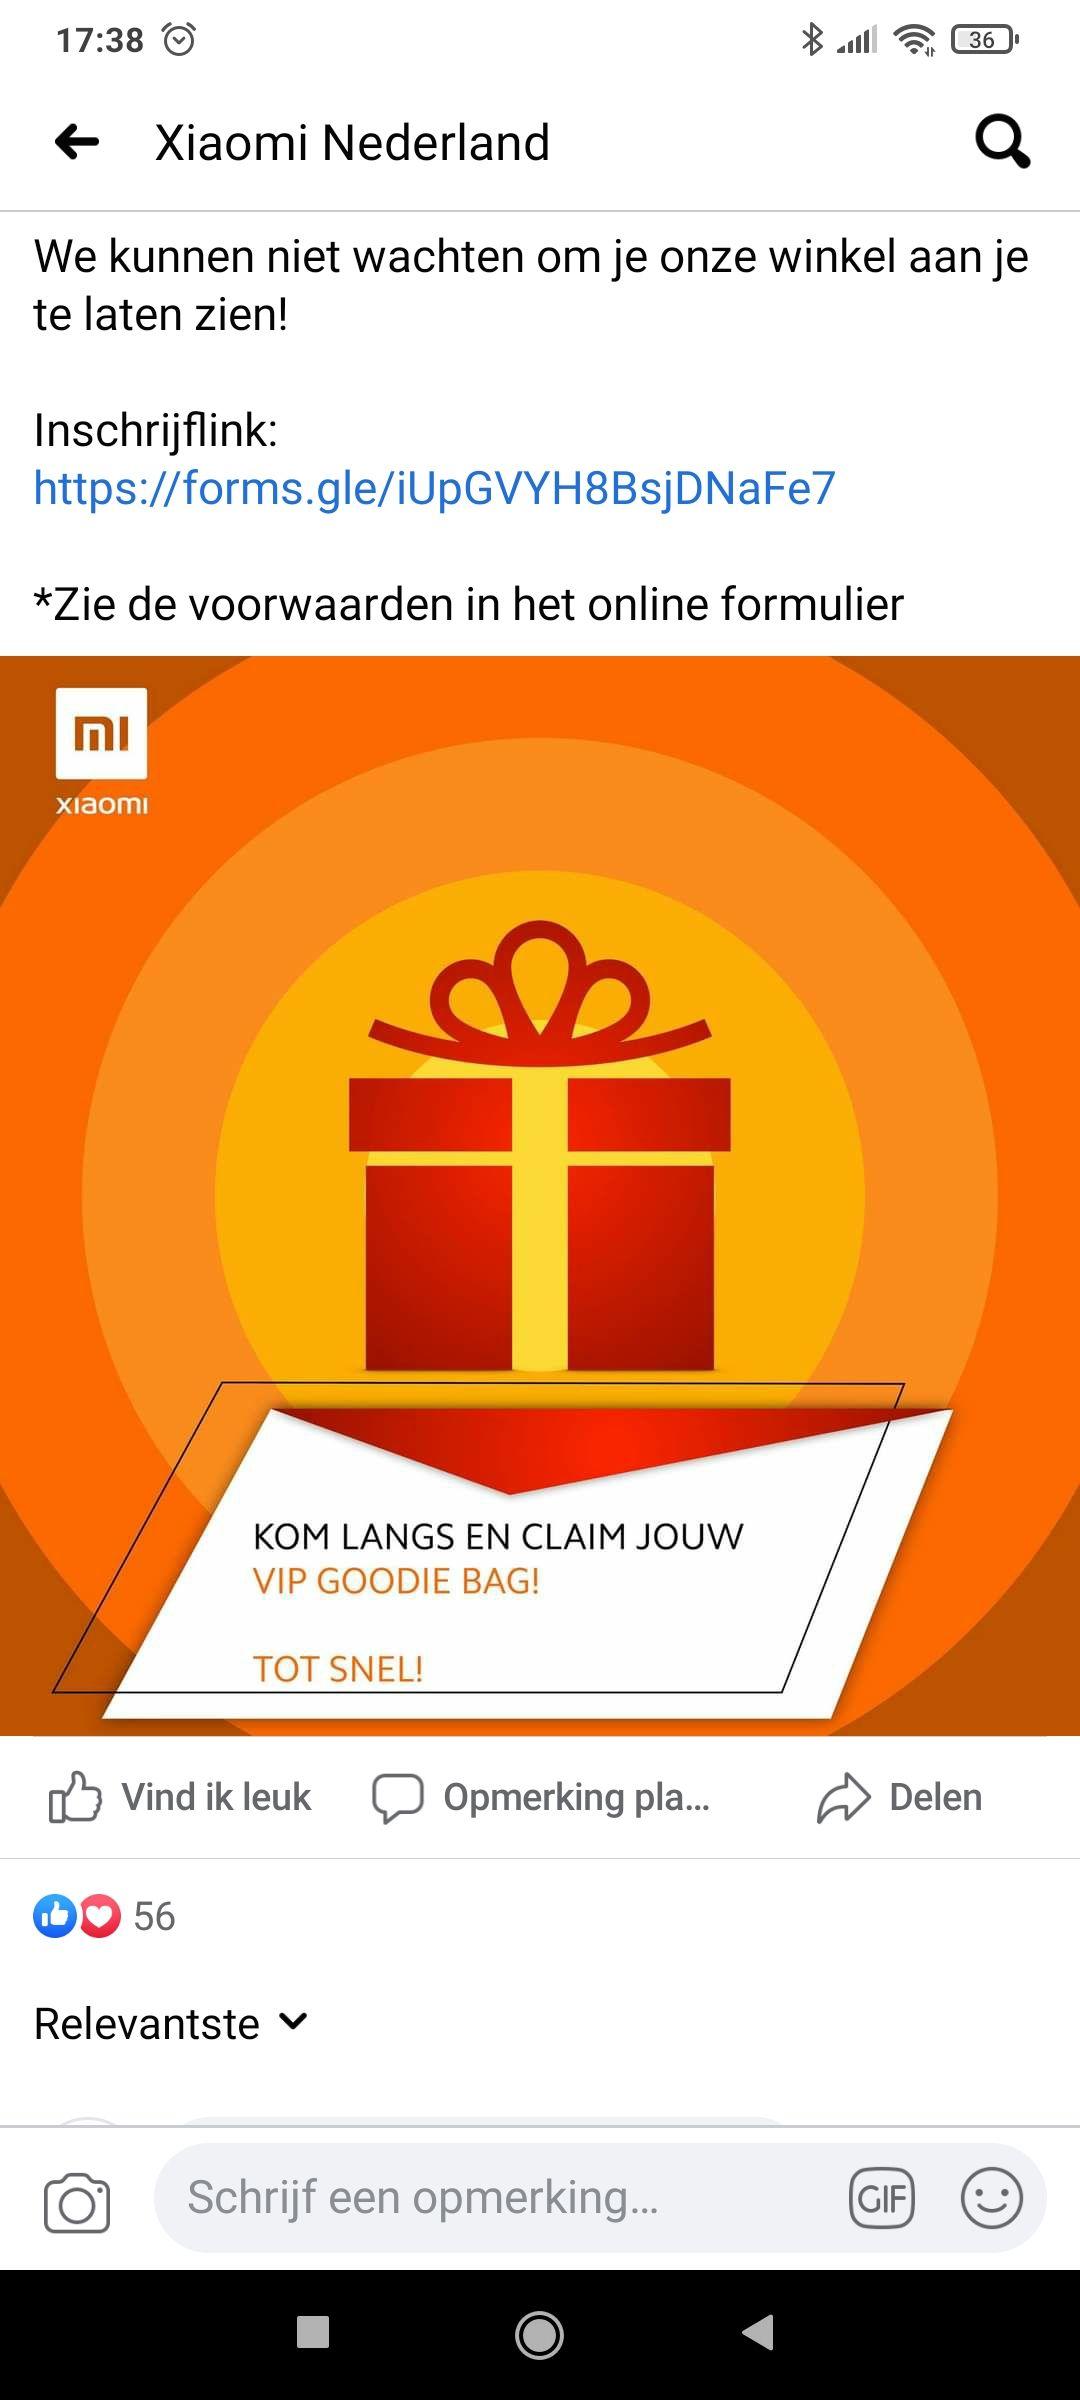 Gratis VIP goodiebag Xiaomi + kortingsvouchers (Rotterdam)